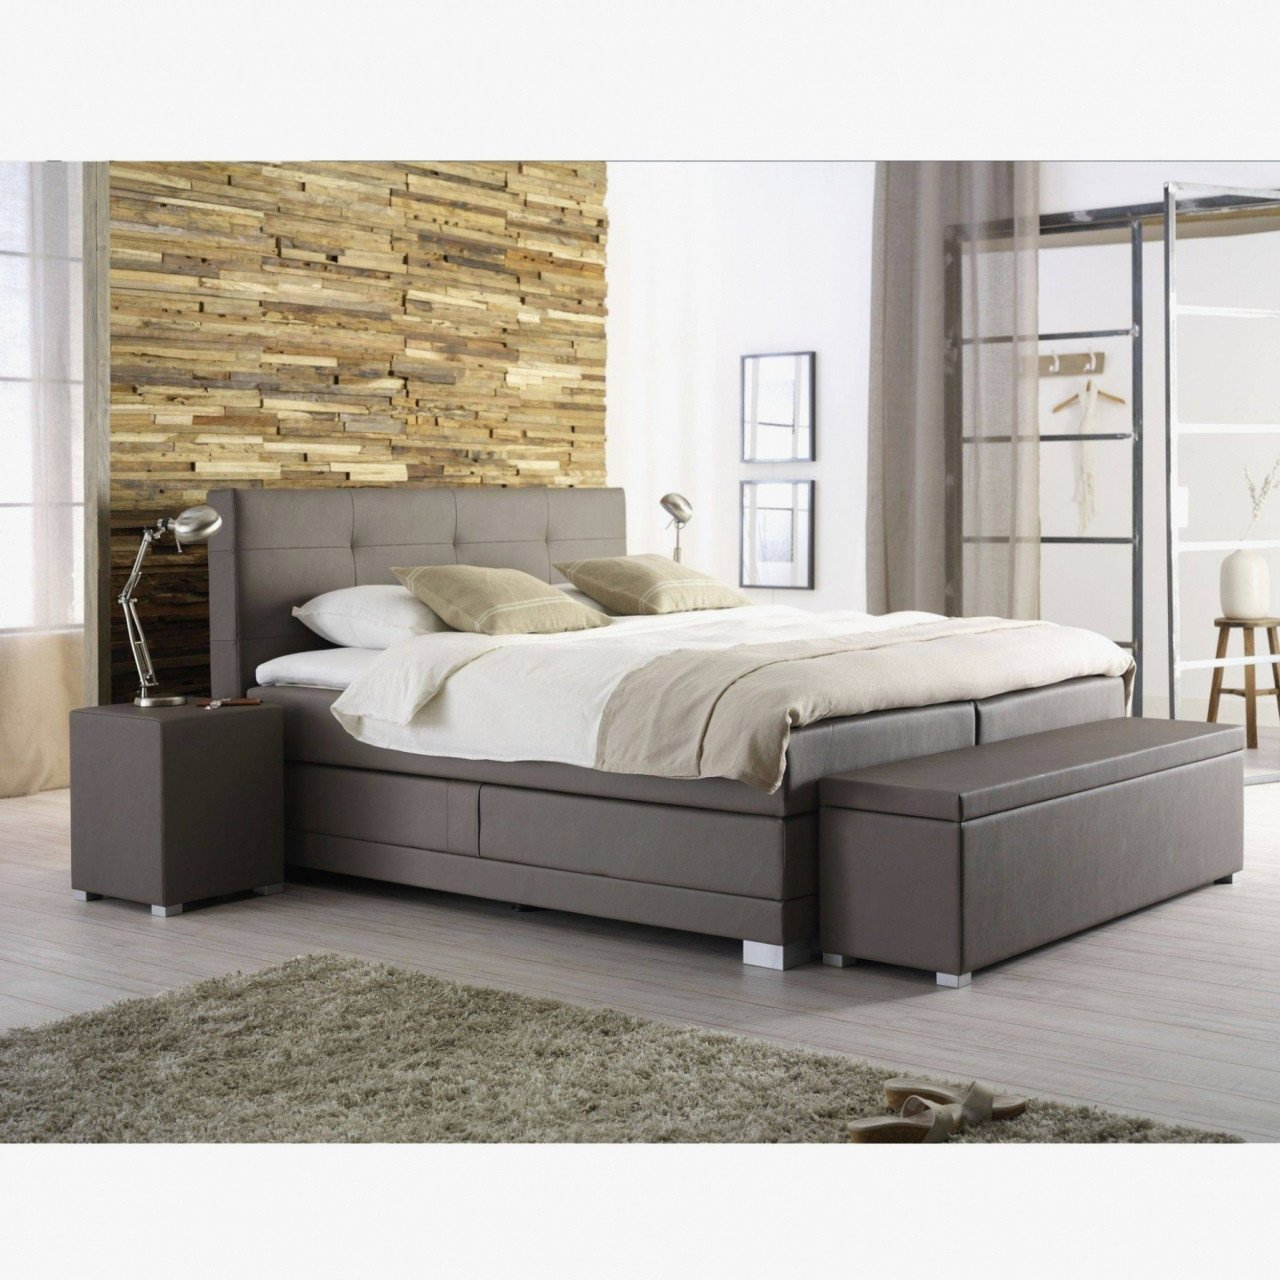 Modern White Bedroom Set Fresh Drawers Under Bed — Procura Home Blog